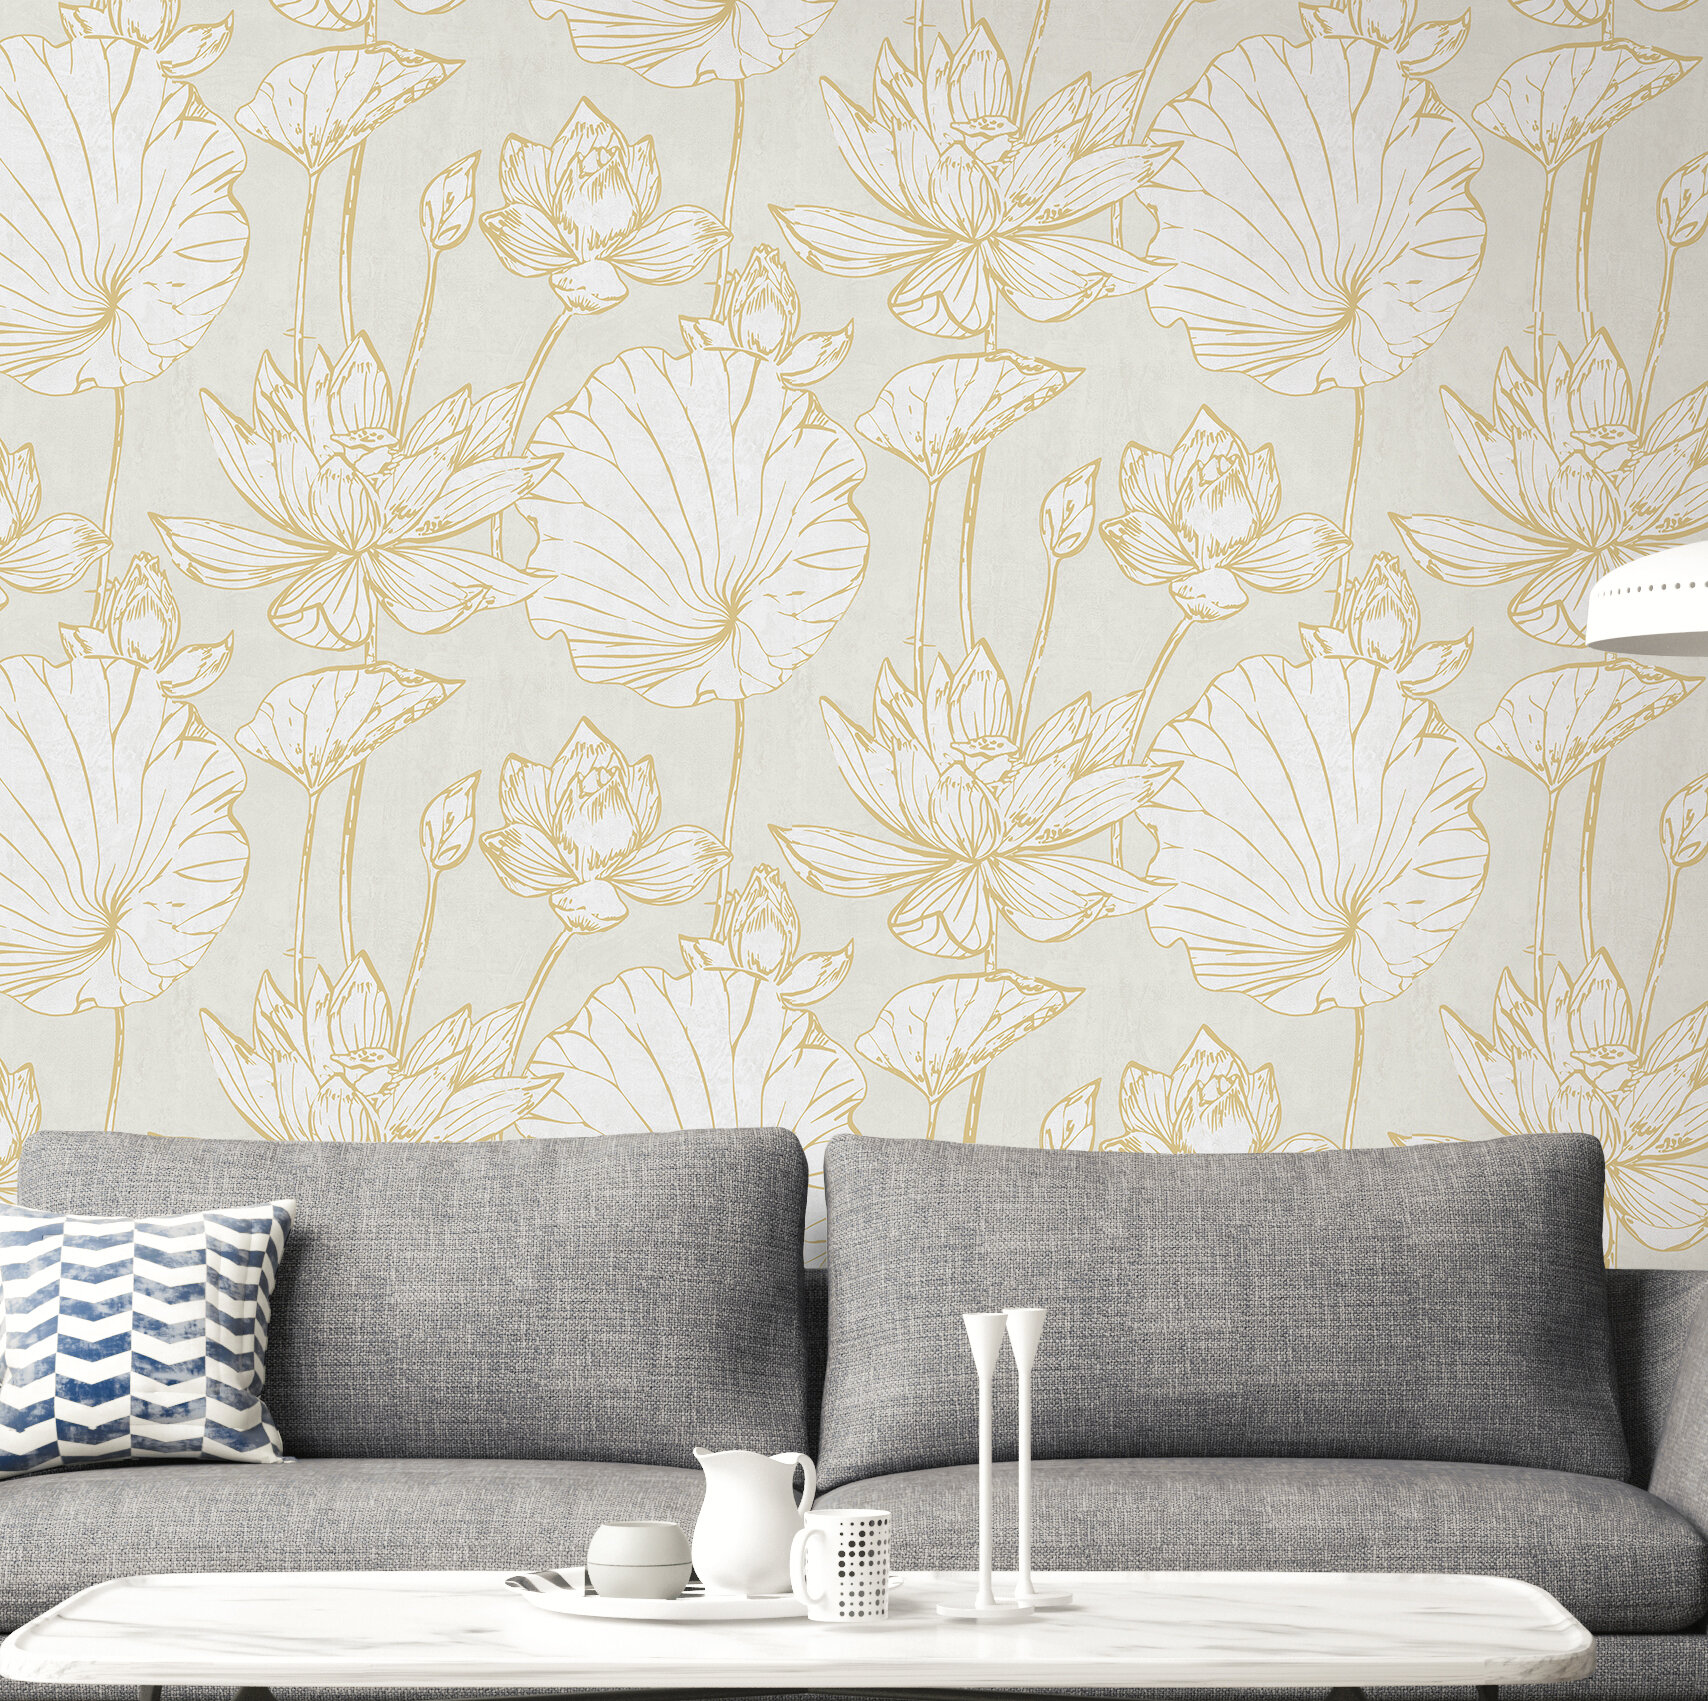 House Of Hampton Artie Lotus Floral 27 L X 27 W Wallpaper Roll